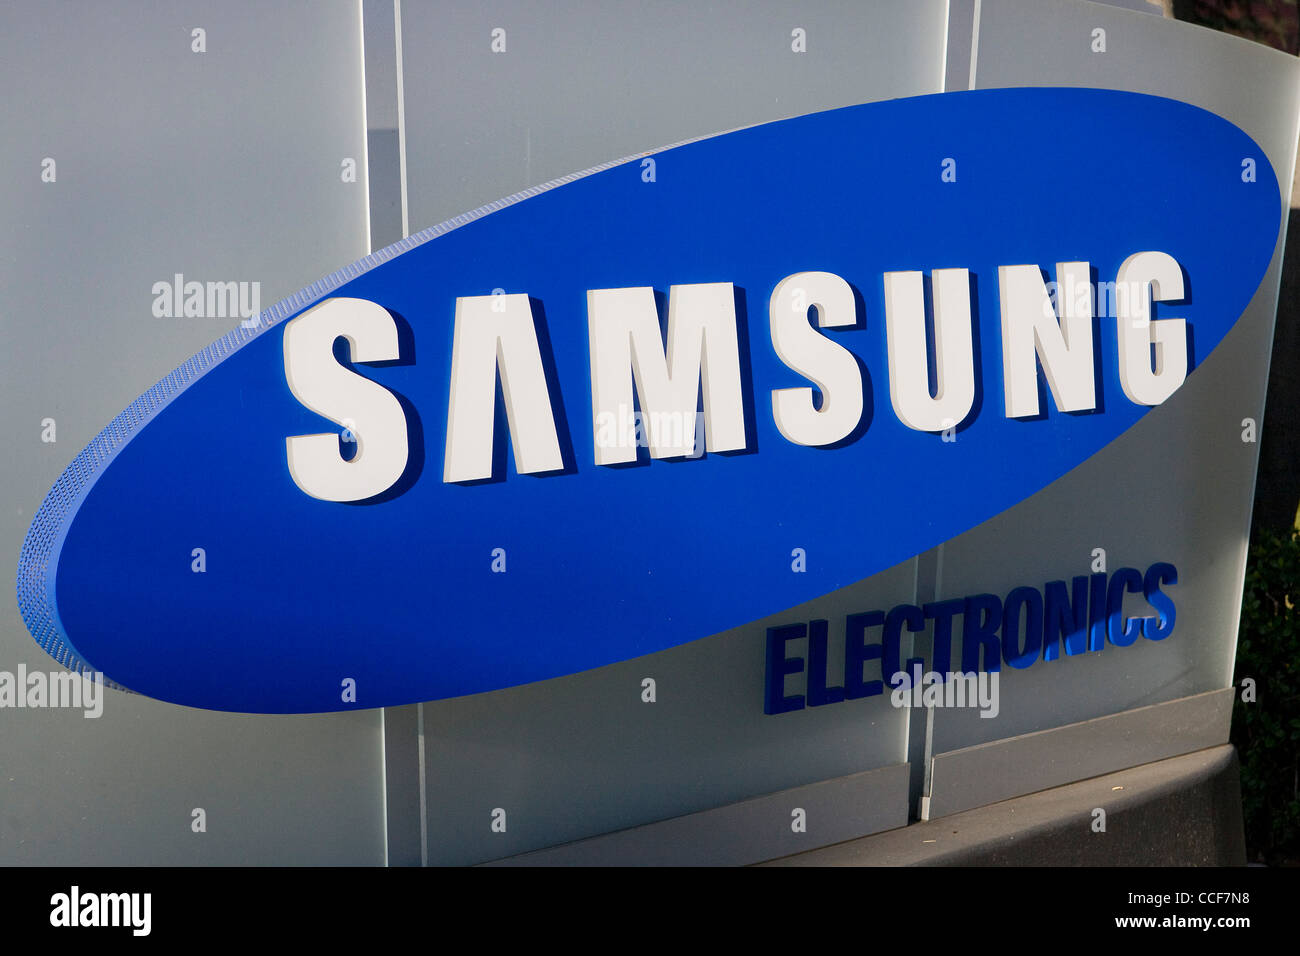 samsung electronics stock photos samsung electronics stock images alamy. Black Bedroom Furniture Sets. Home Design Ideas